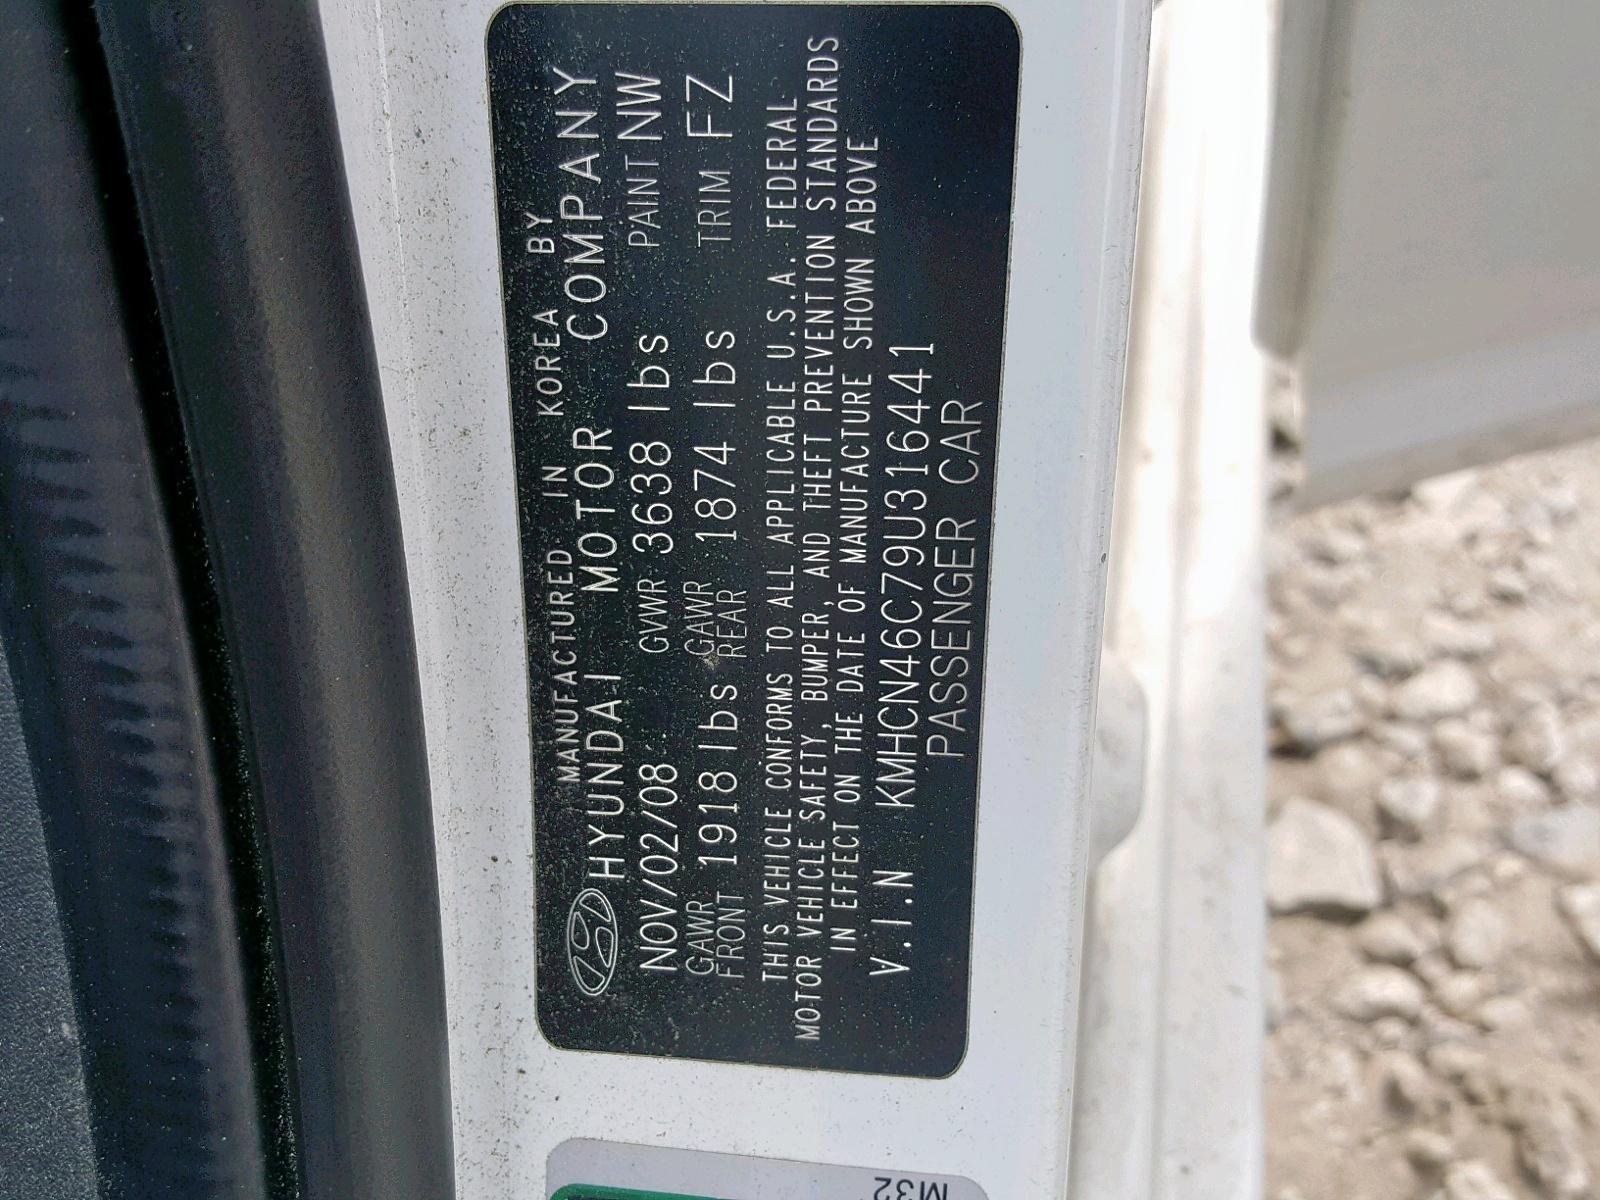 KMHCN46C79U316441 - 2009 Hyundai Accent Gls 1.6L